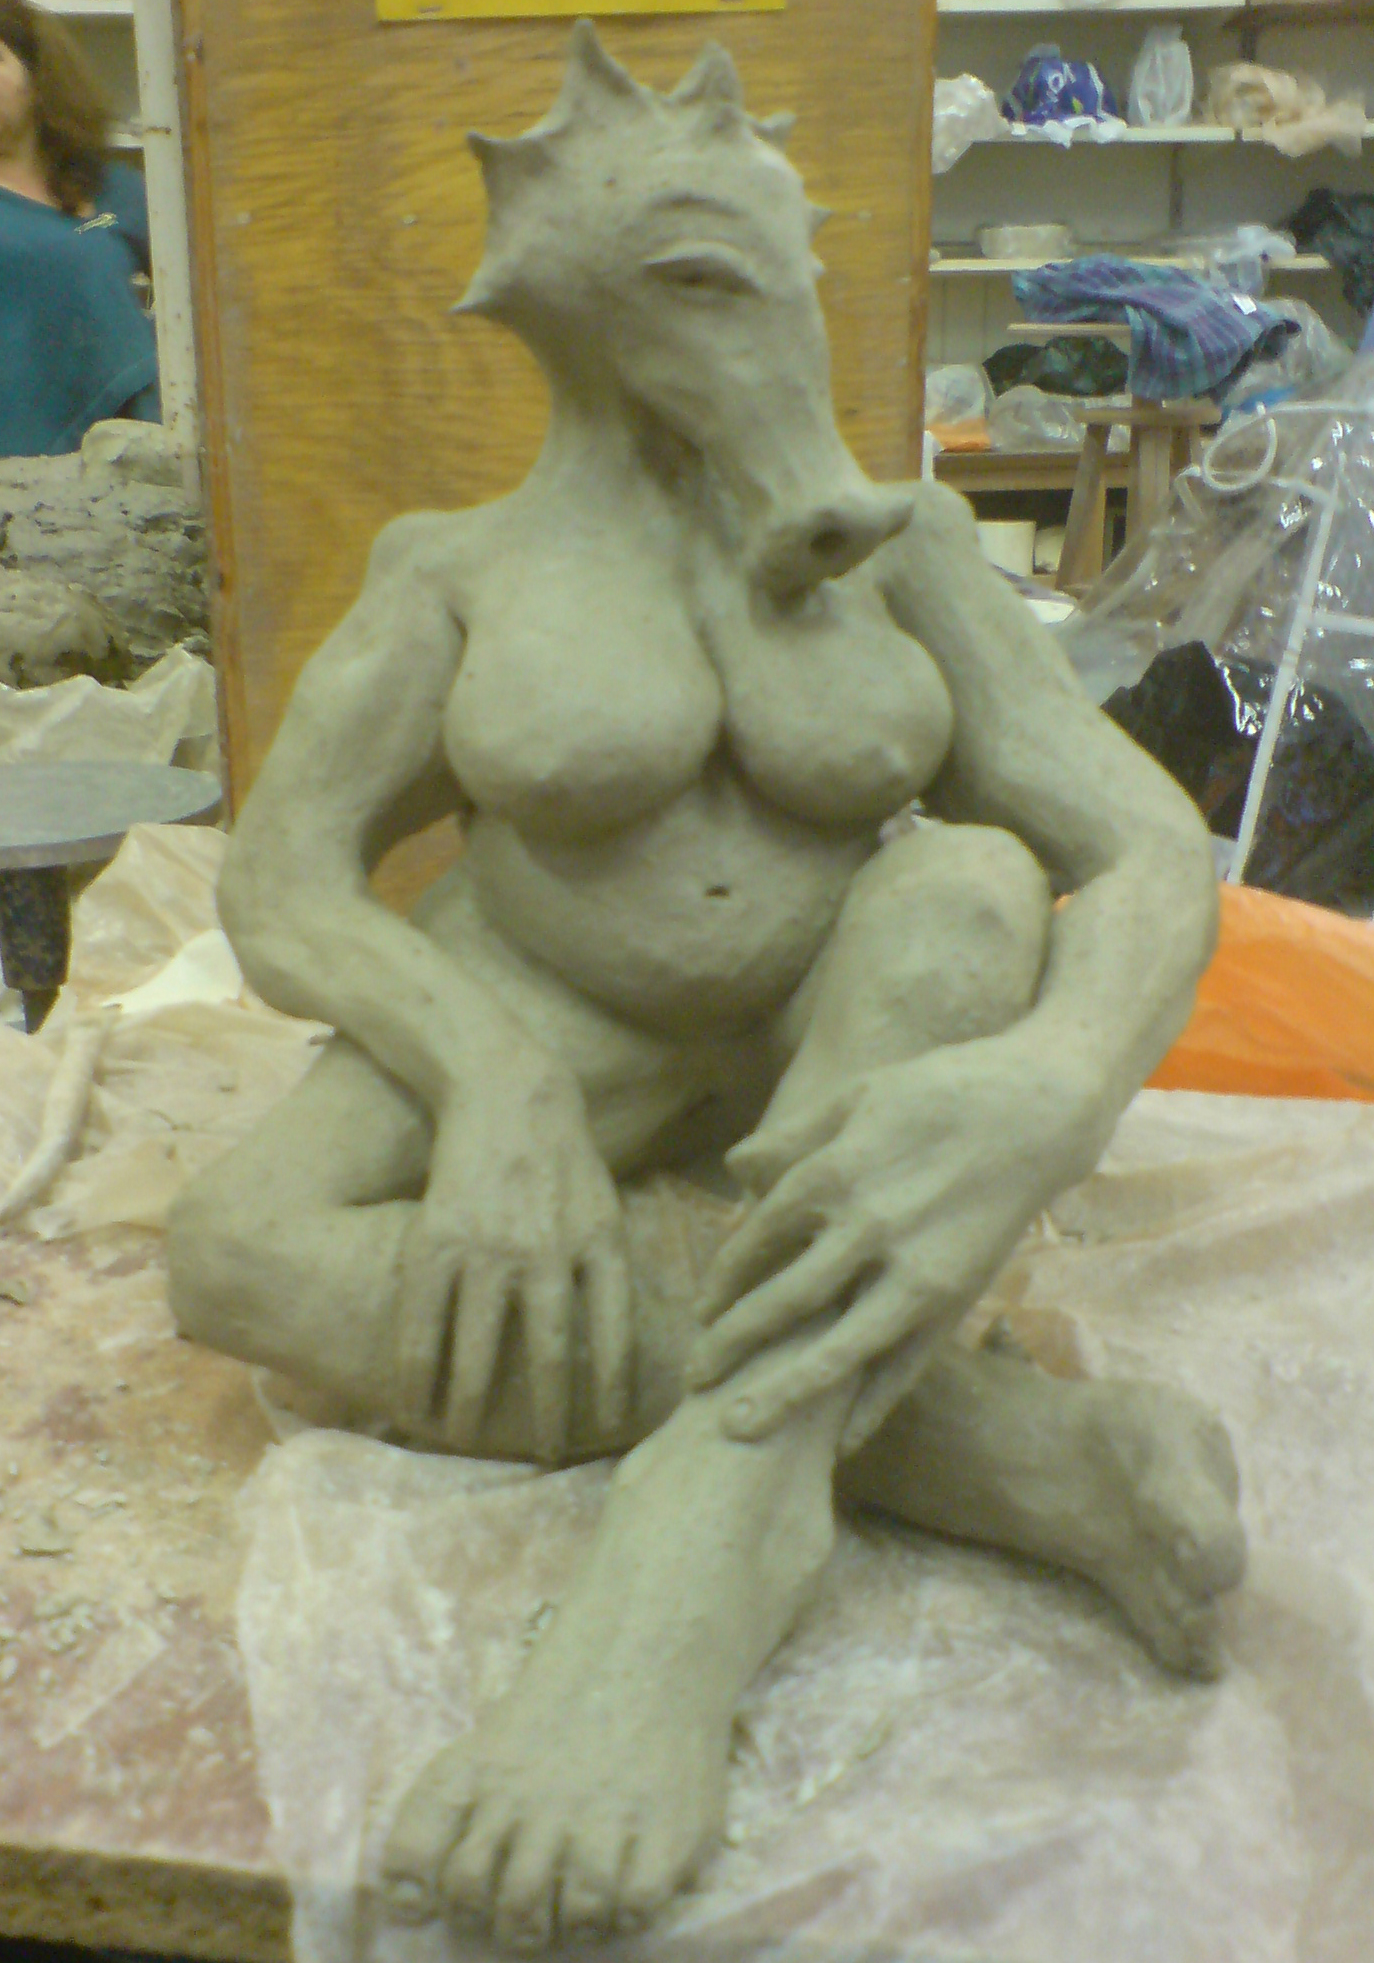 'Dragon lady' by CJ Munn (work in progress) - sold.